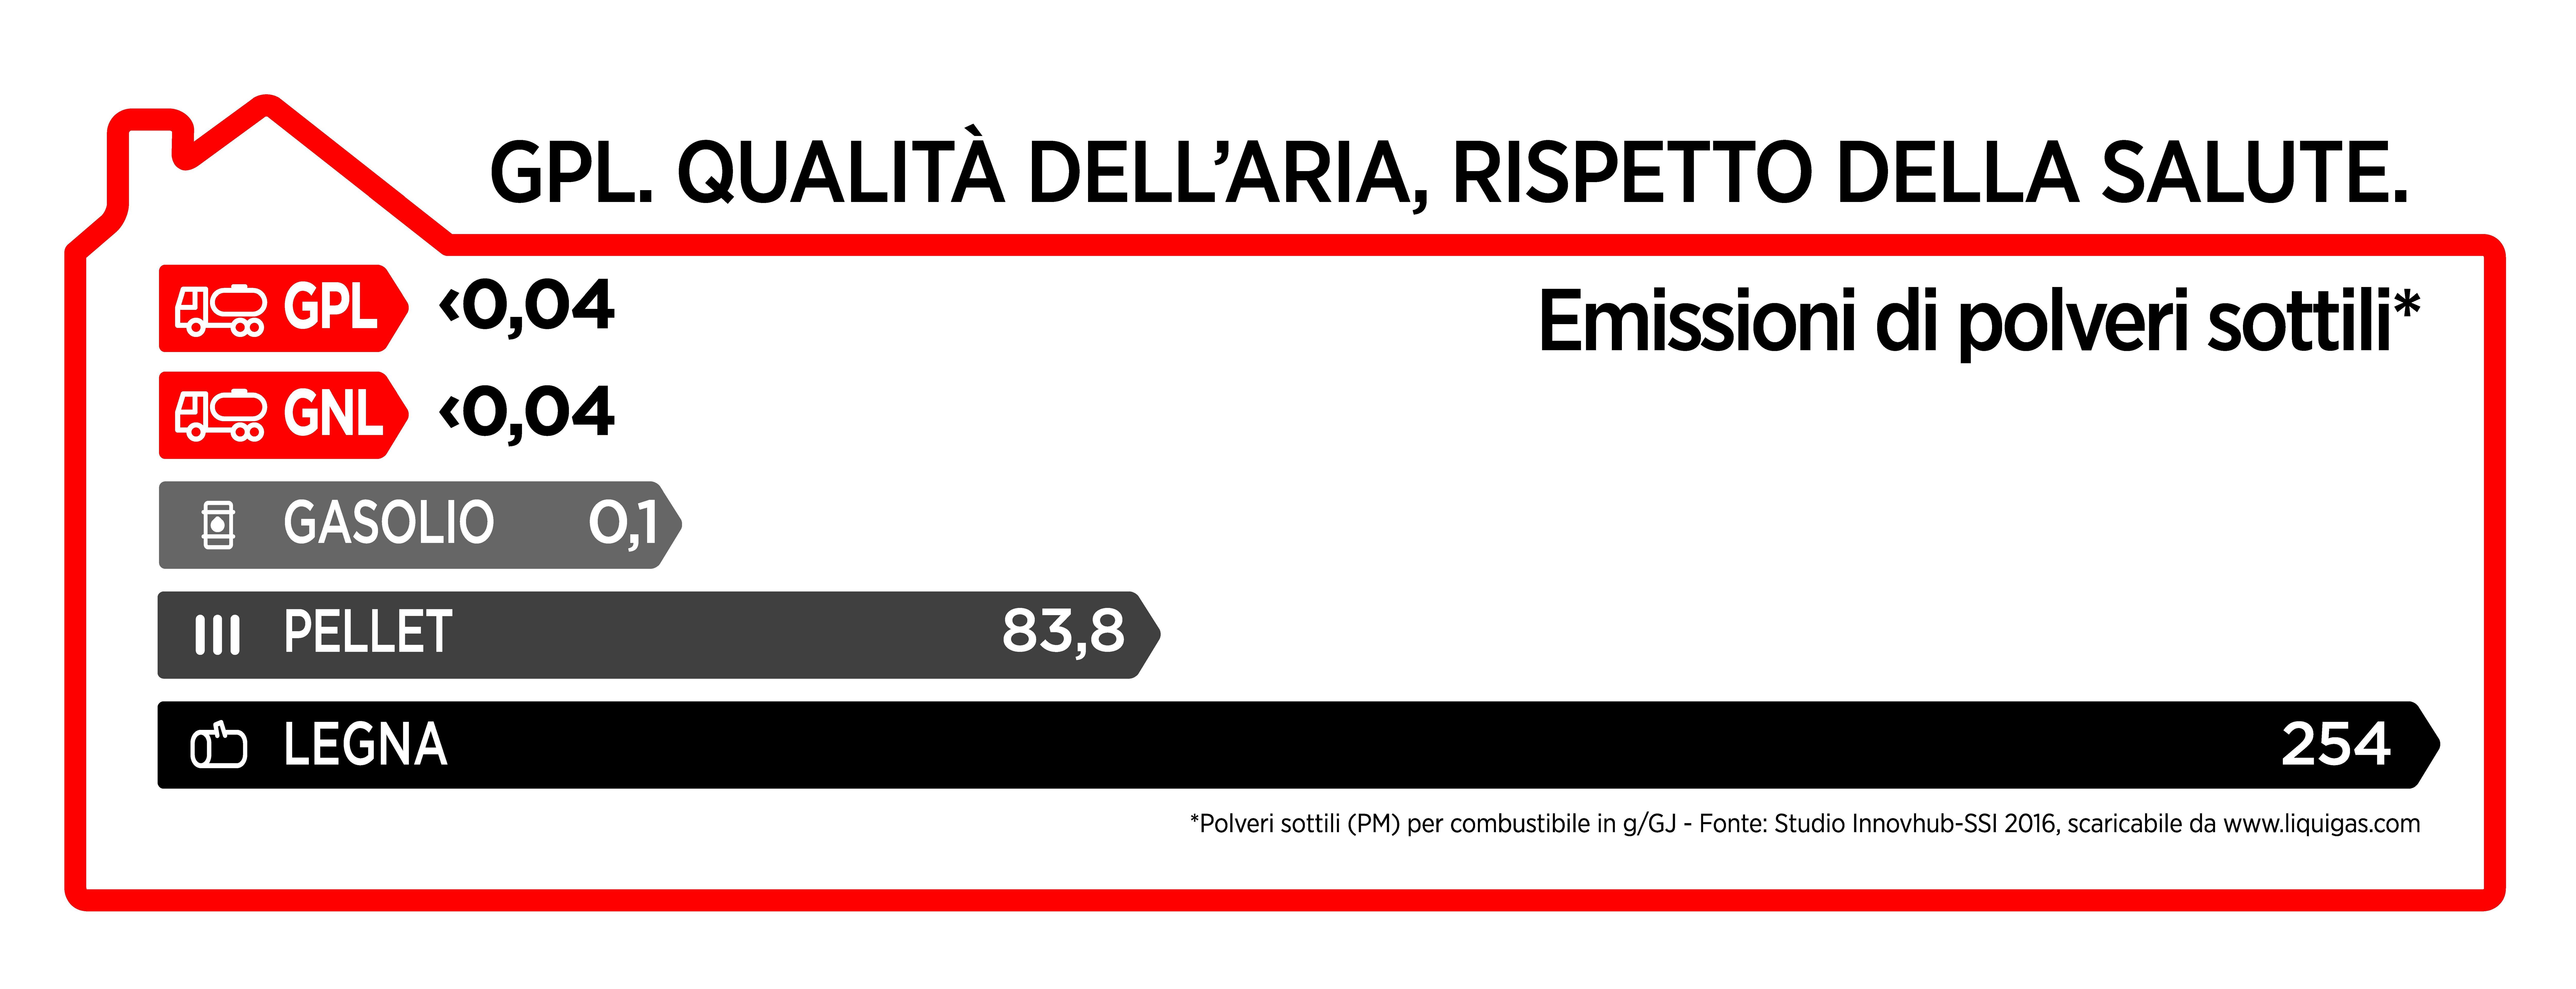 Infografica Emissioni